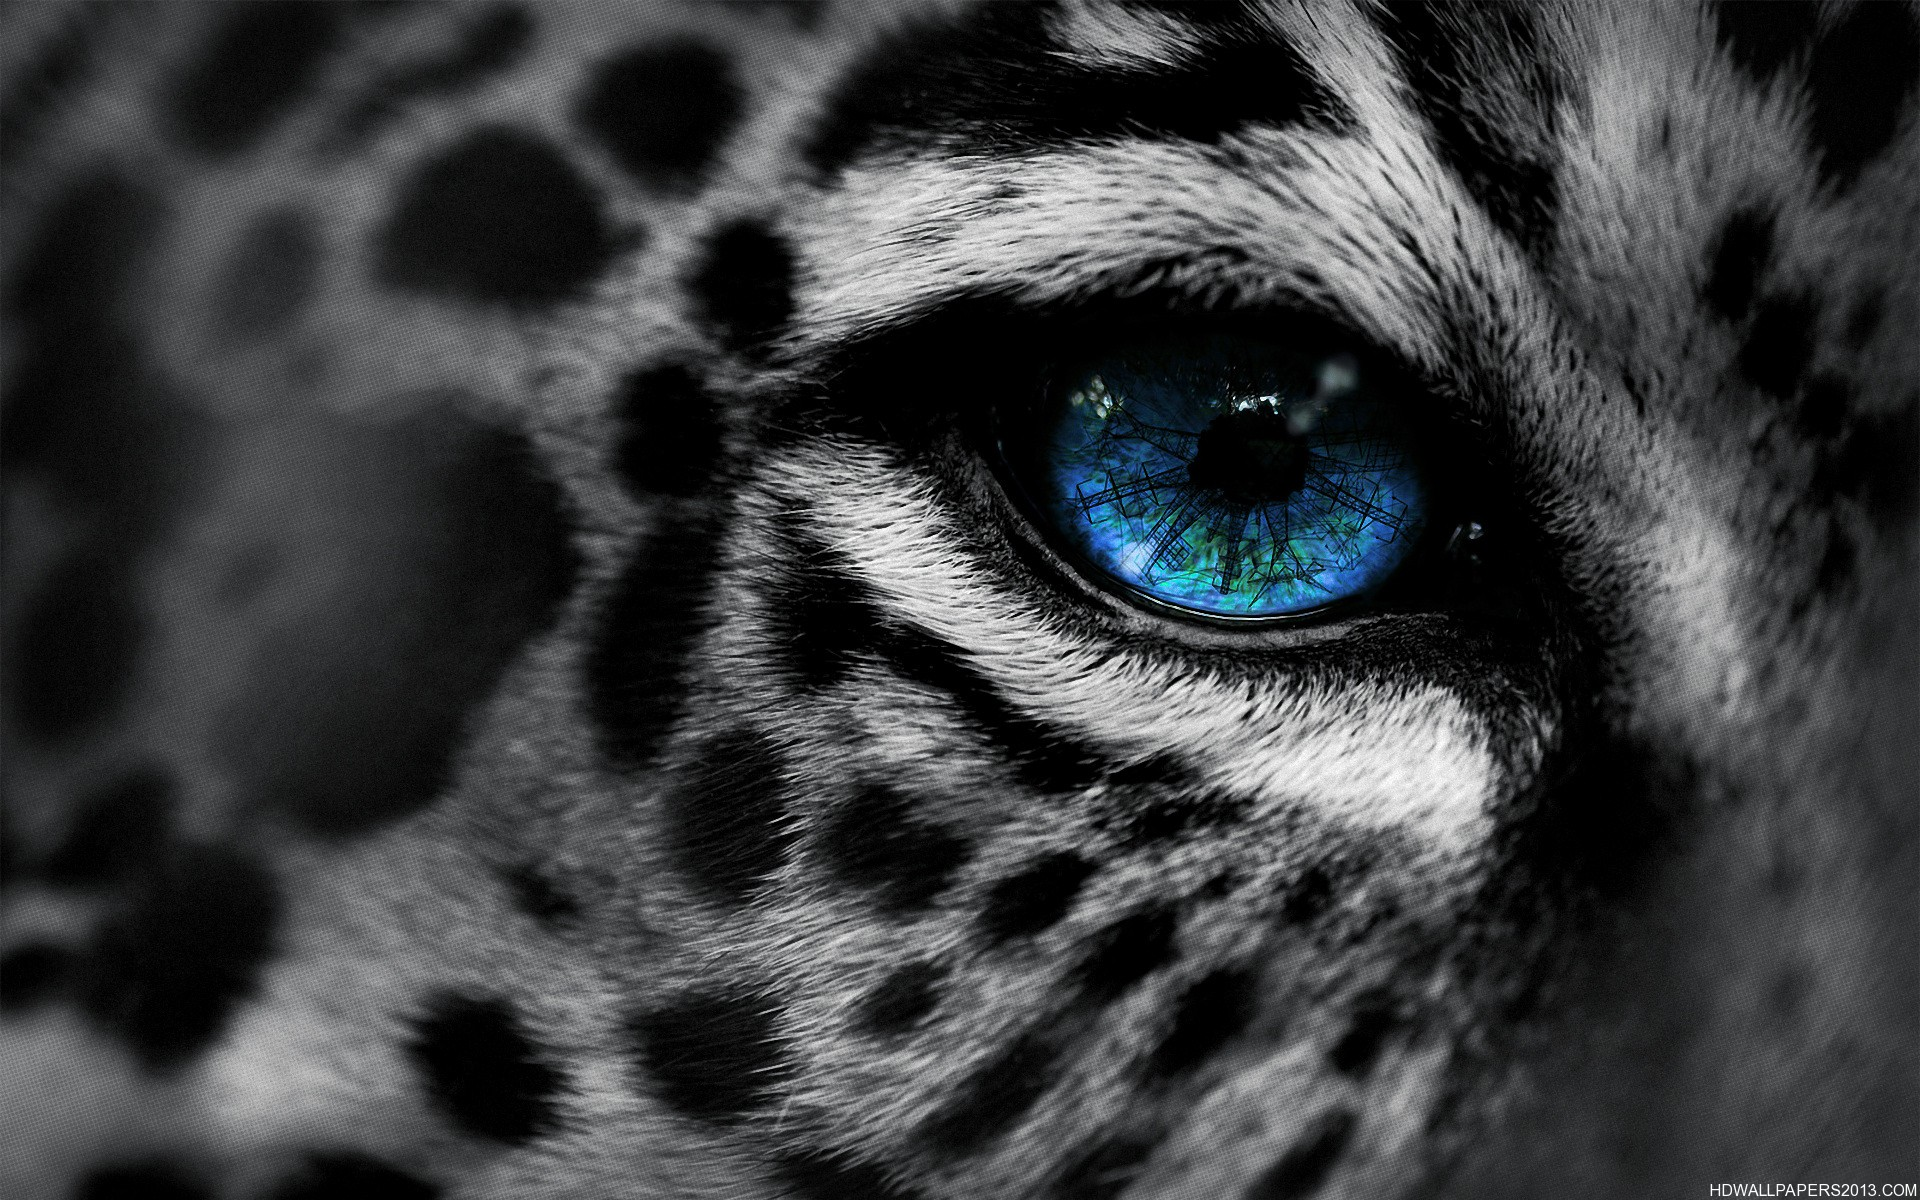 Eye-of-The-Tiger jpg (1920×1200) | HD Wallpapers | Pinterest